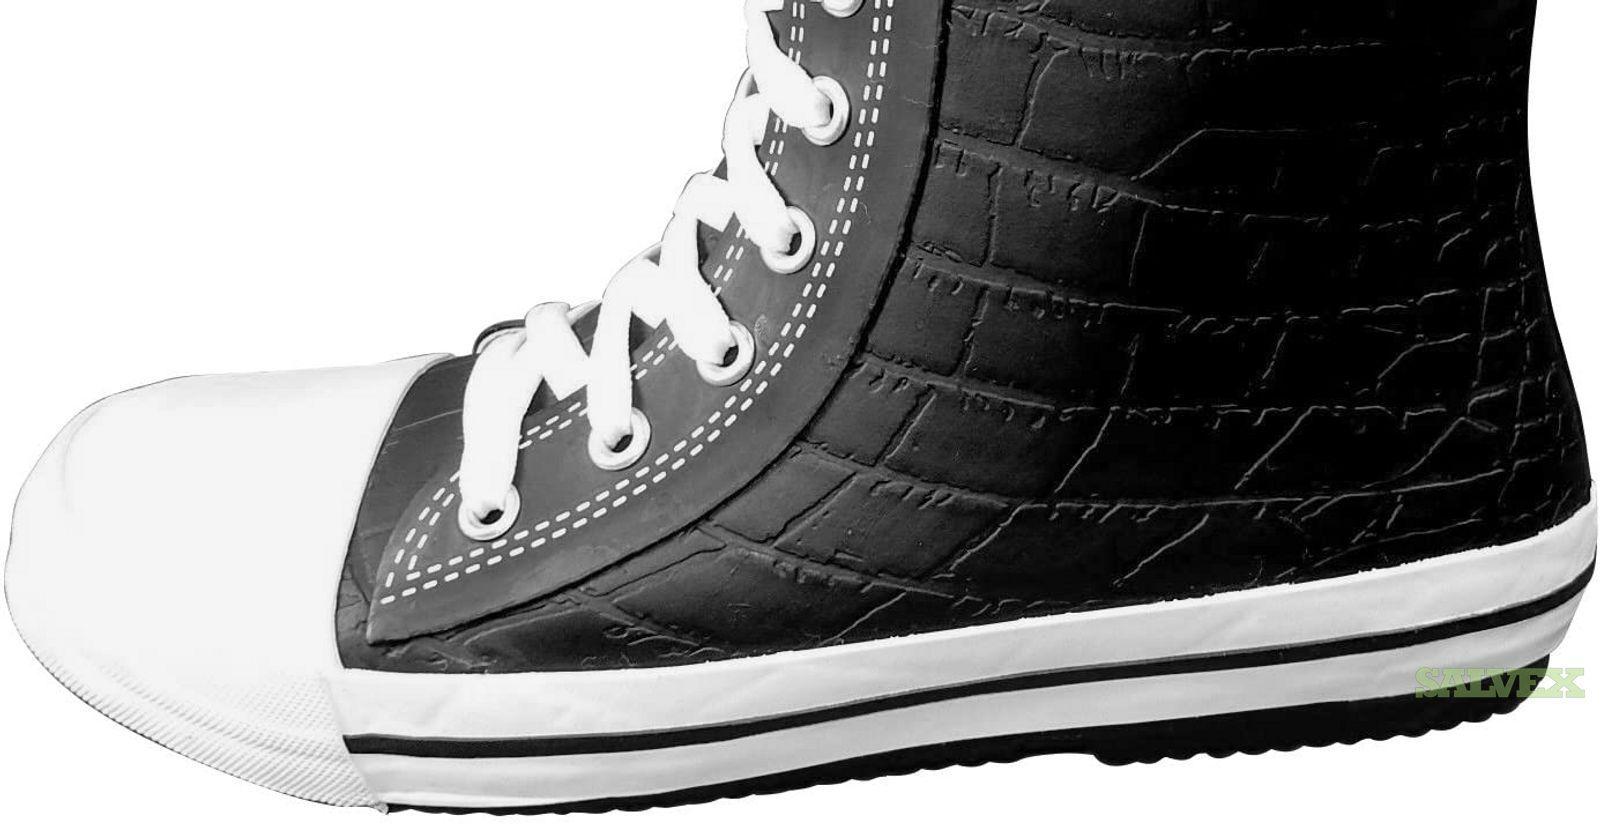 Elvetik Swiss Design Black Alligator Rubber Lace-up Boots (1000 Pairs)